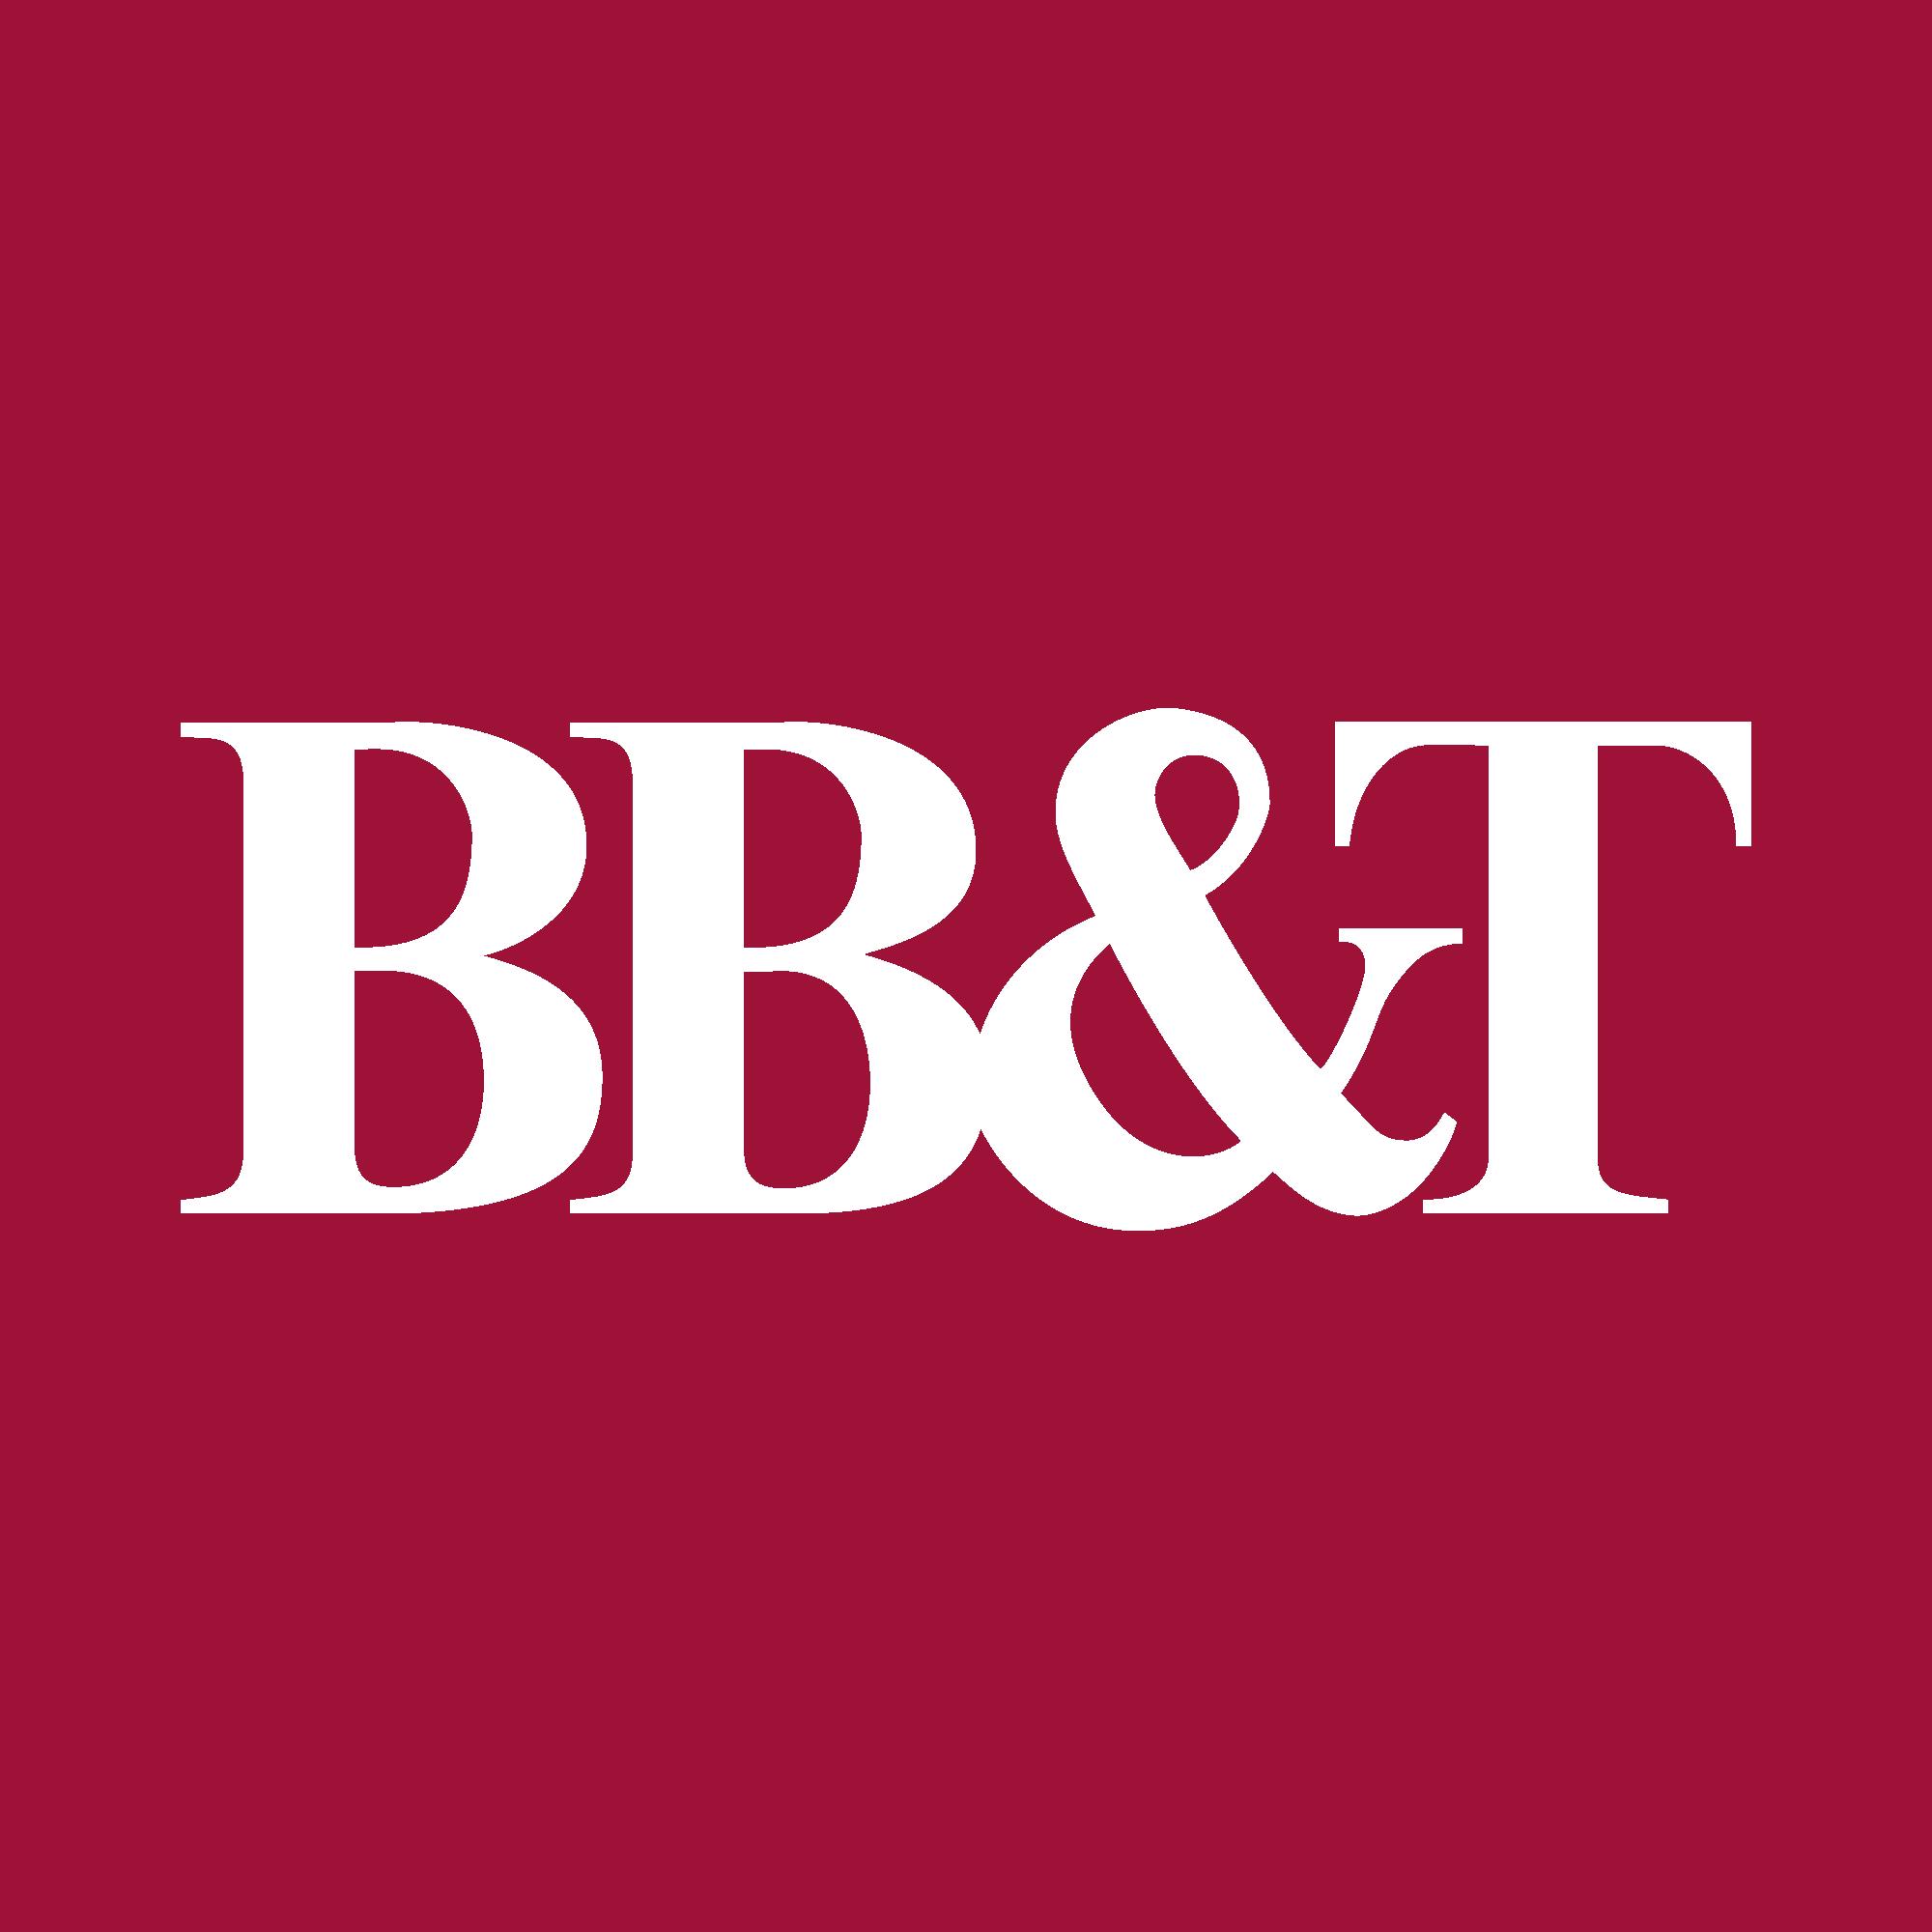 BBT Block 10 inch - PDF - 2016.png